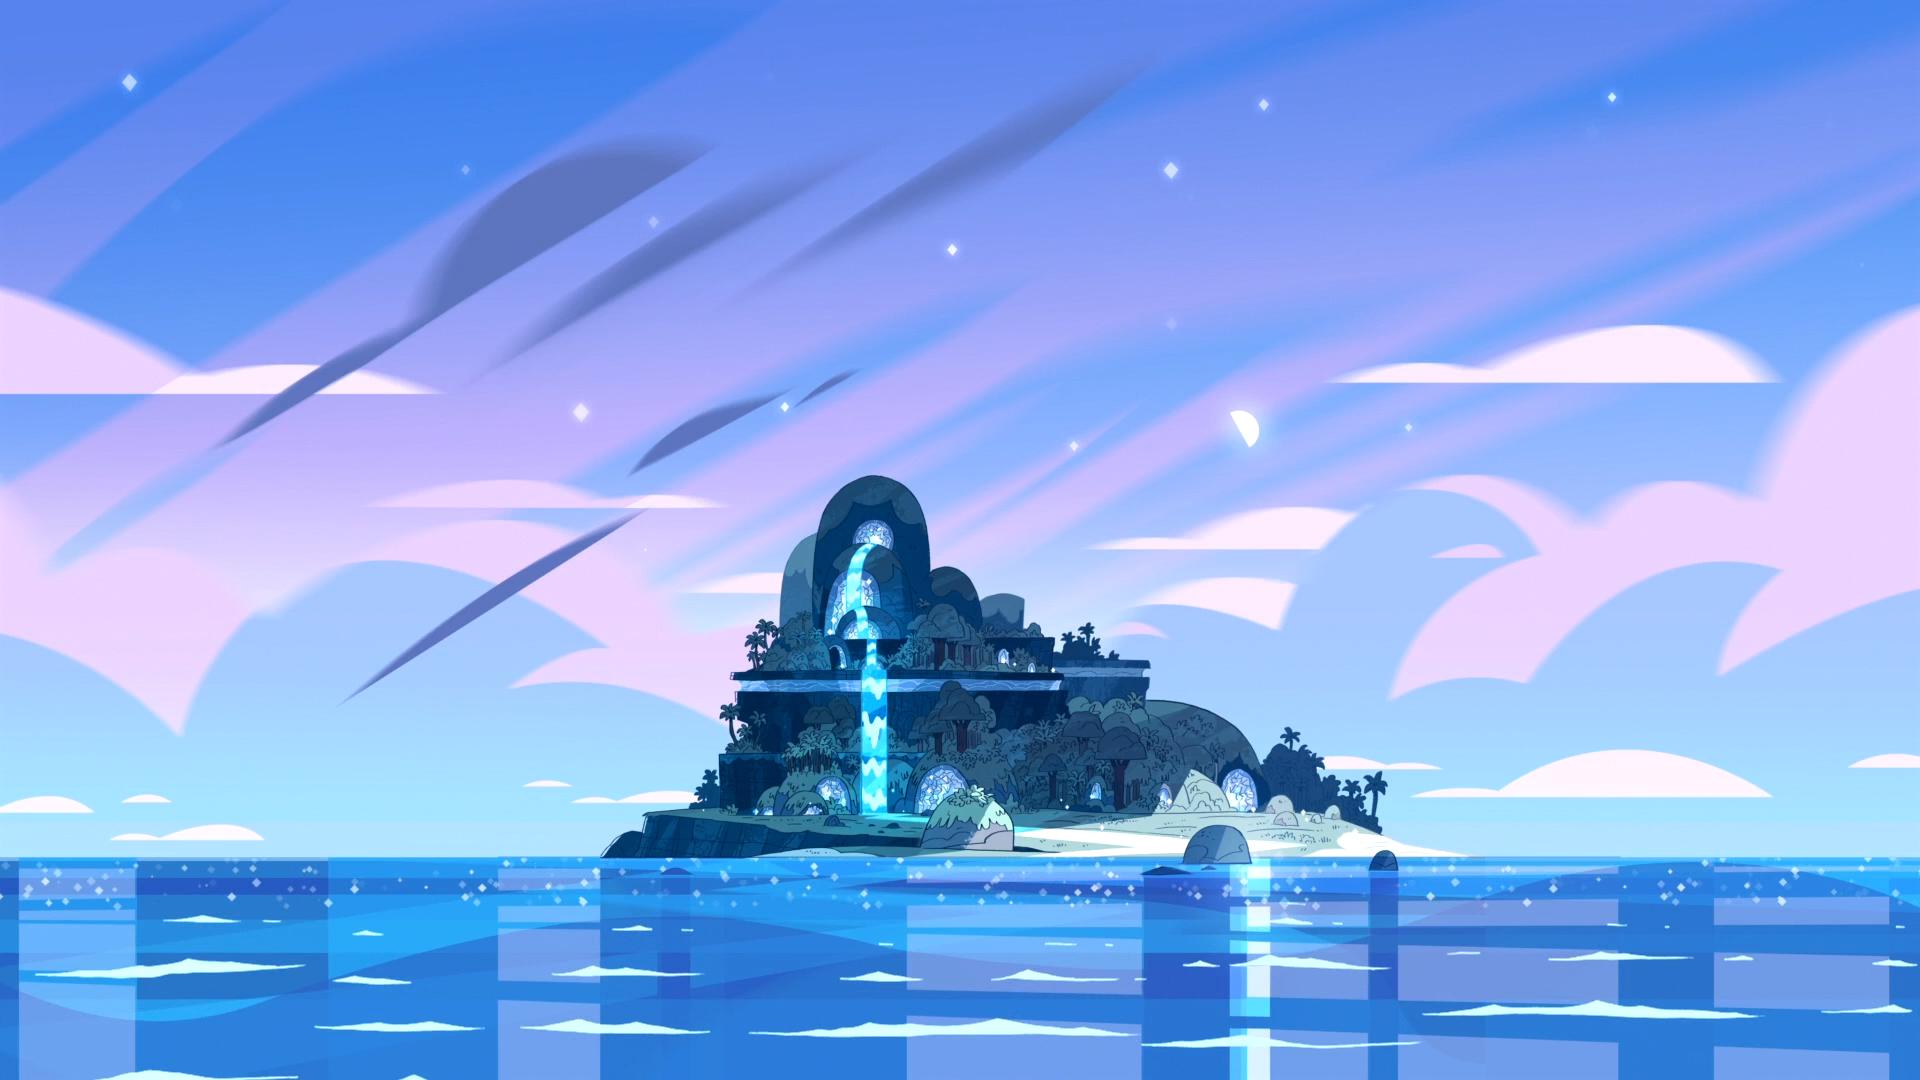 Cool Wallpaper High Quality Steven Universe - reflection-sky-vehicle-cartoon-Steven-Universe-landmark-screenshot-computer-wallpaper-atmosphere-of-earth-80676  You Should Have_13834.png